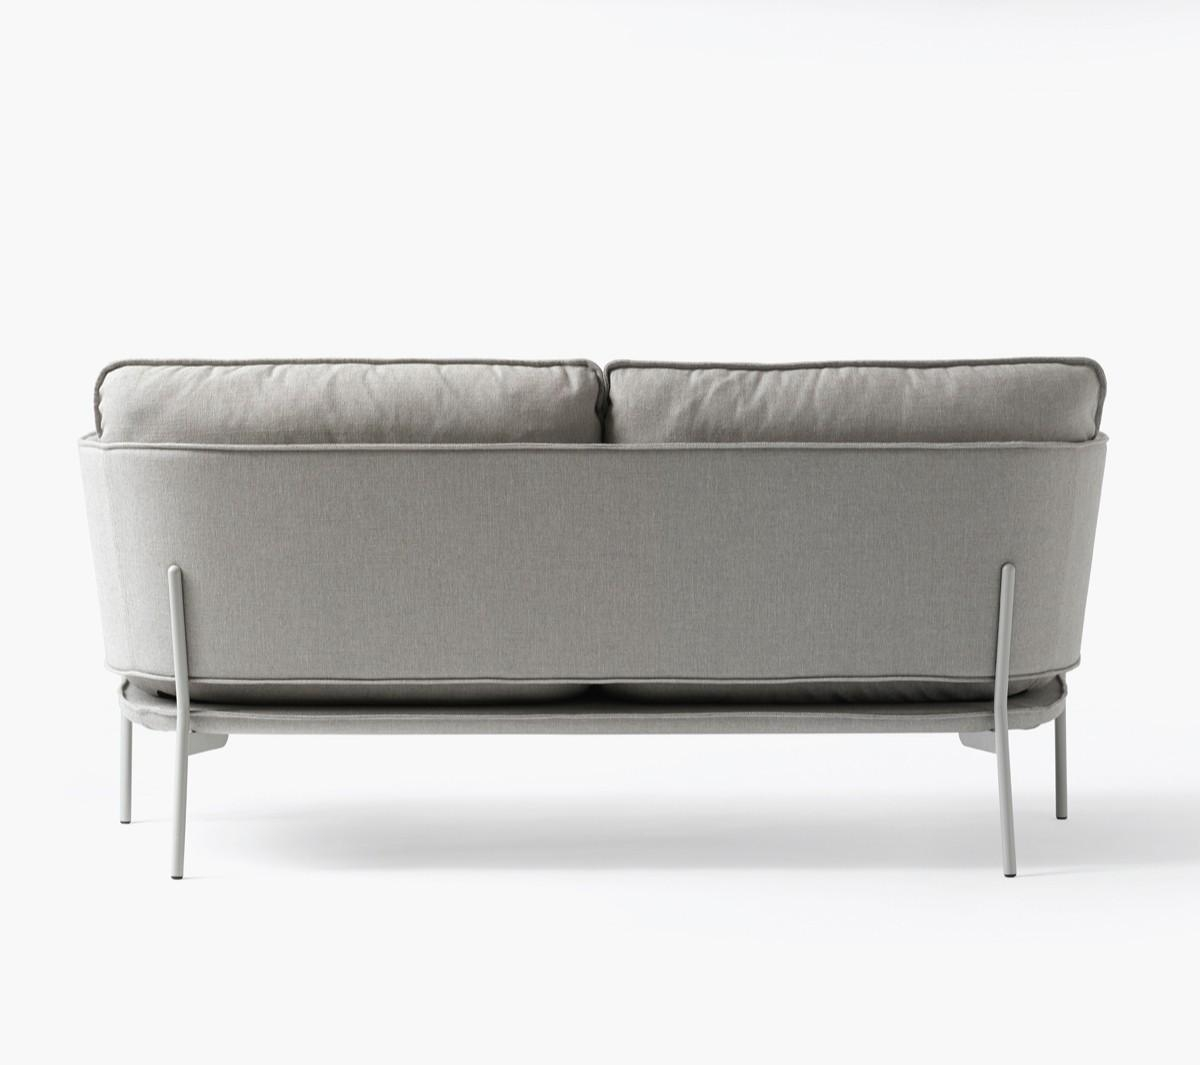 Levitating Cloud Sofa (Image 19 of 20)